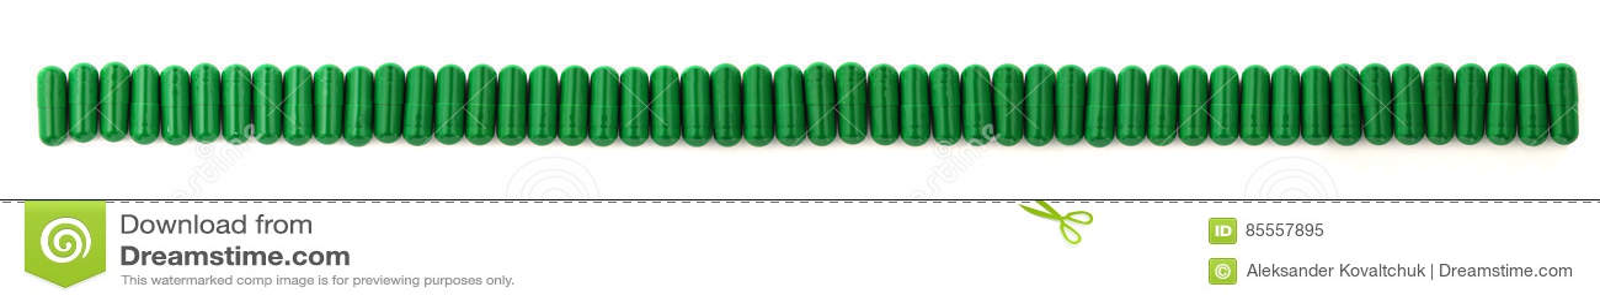 Grüne Kapseln, die in Folge stehen